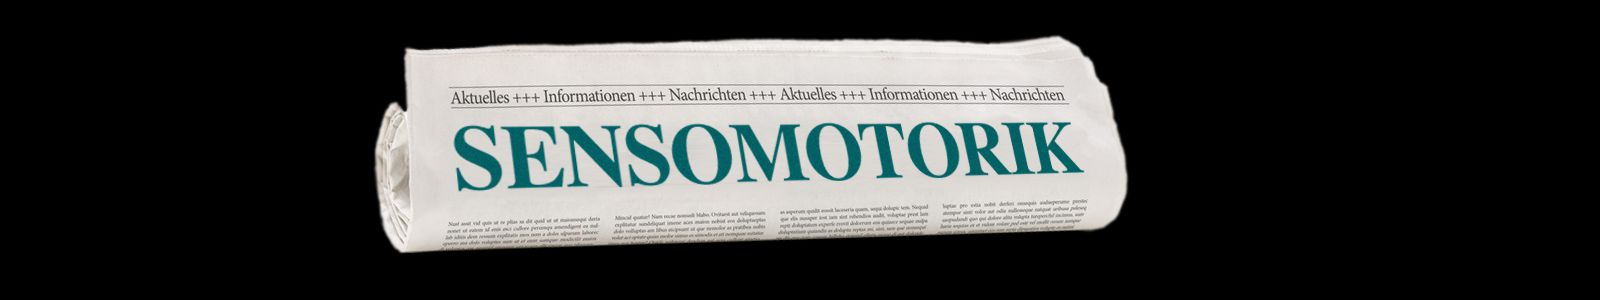 image of newspaper with Sensomotorik as headline